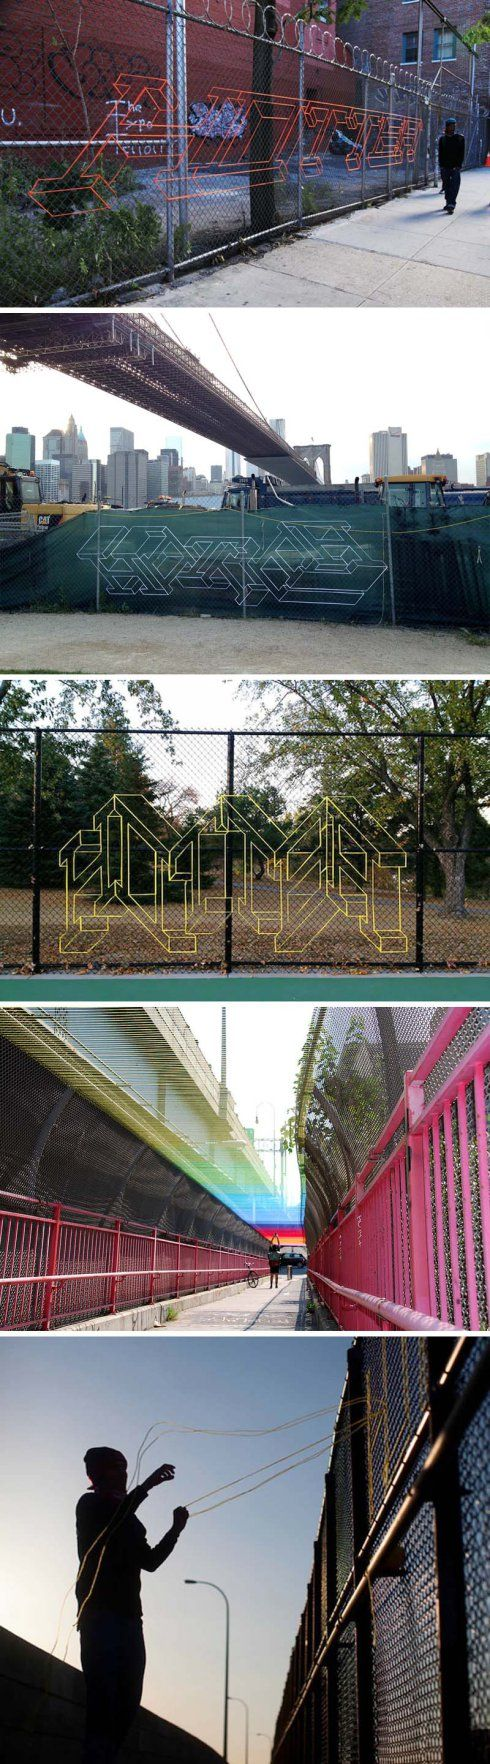 best ooh images on pinterest street art urban art and public